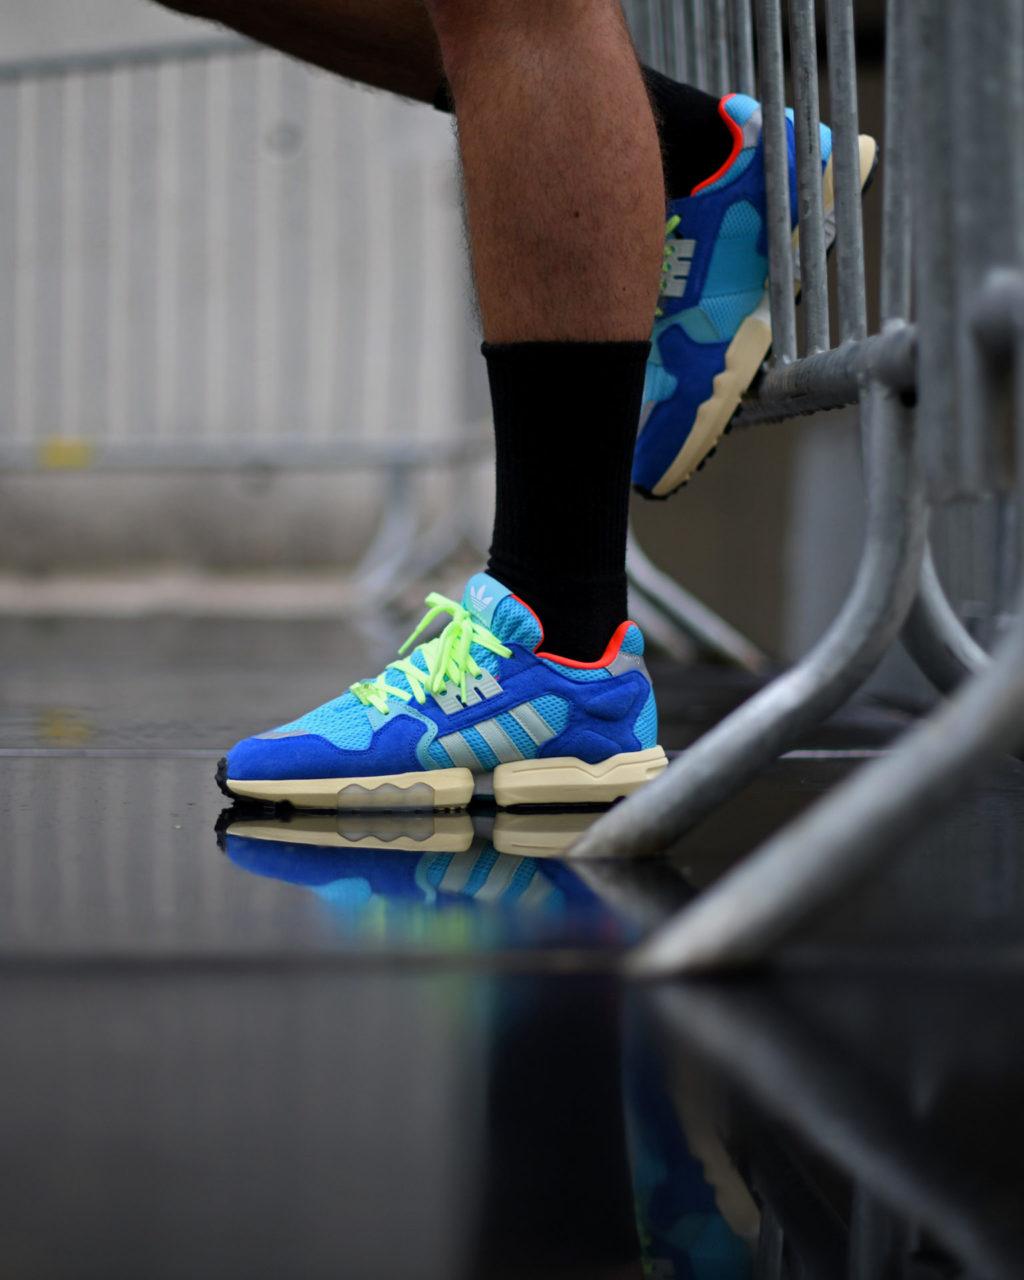 torsion adidas zx